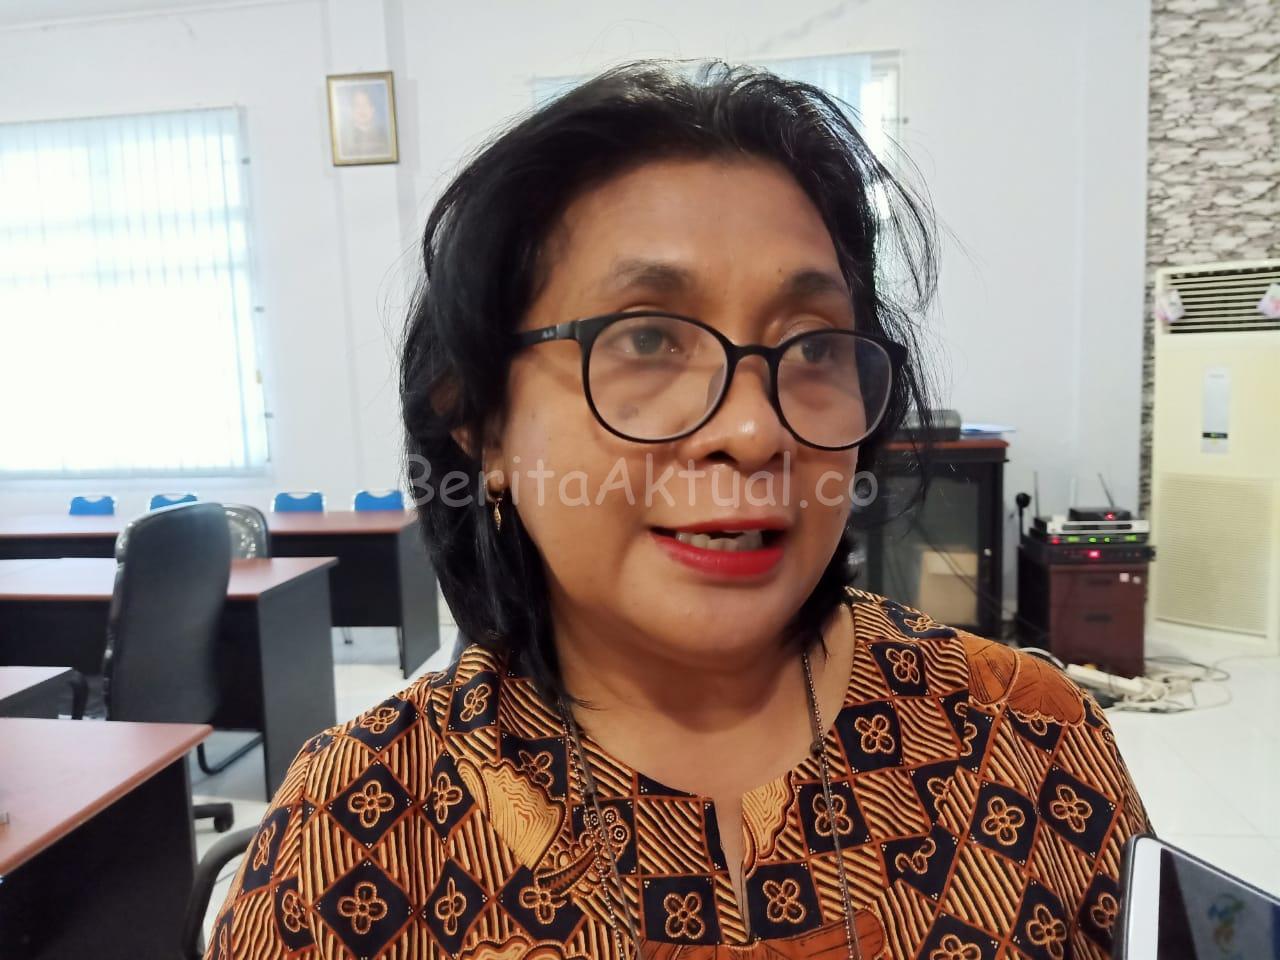 Pengangguran Terbuka di Papua Barat 484.175 Orang, Meningkat 5,01 Persen 26 IMG 20200506 WA0000